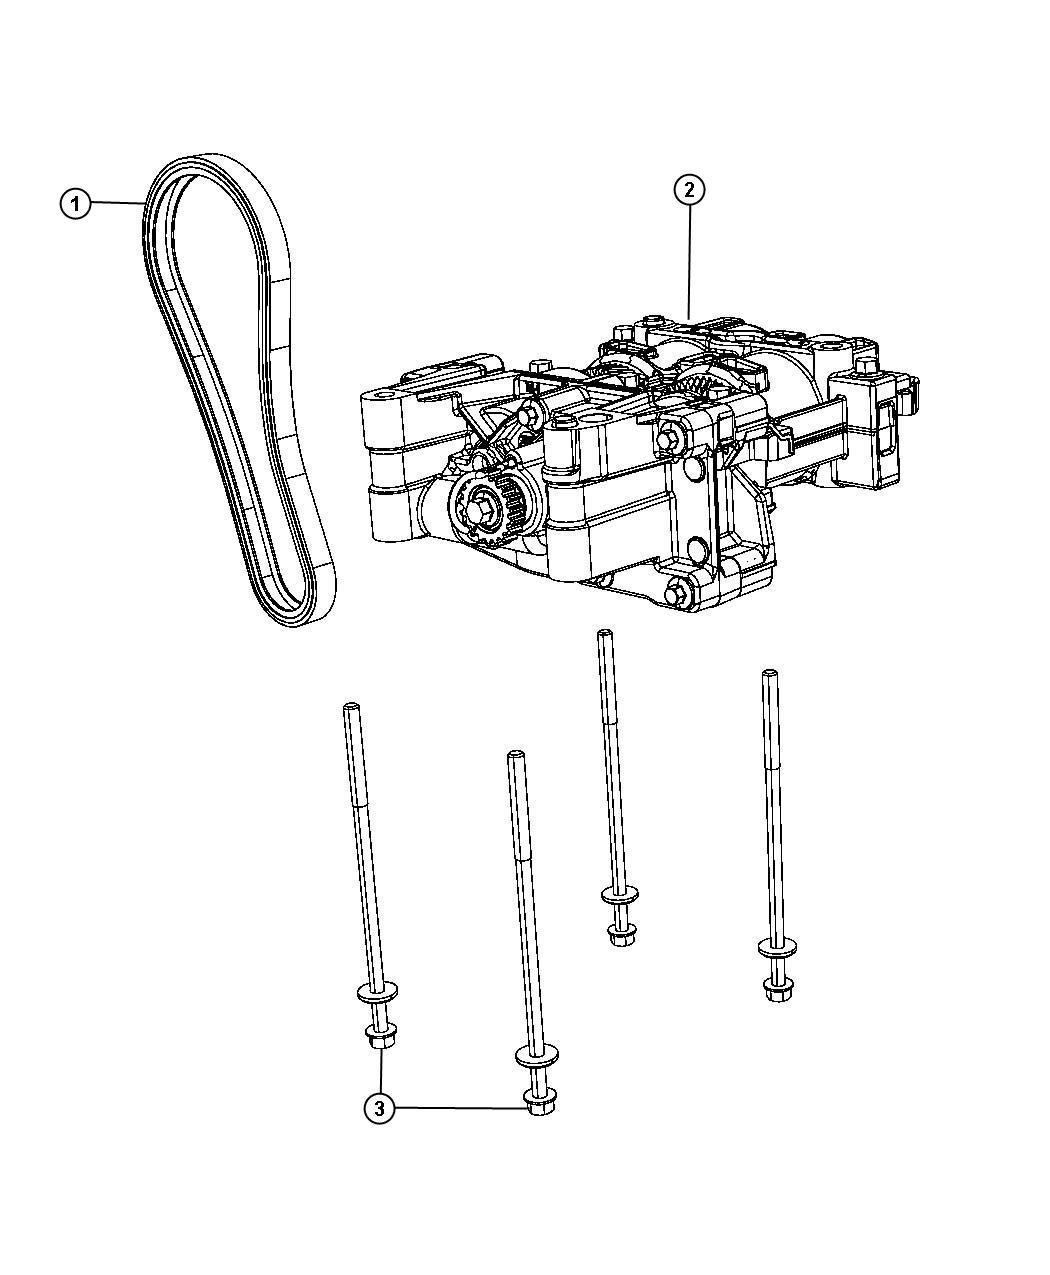 Dodge Dart Shaft Balance Oil Pump Engine Assembly